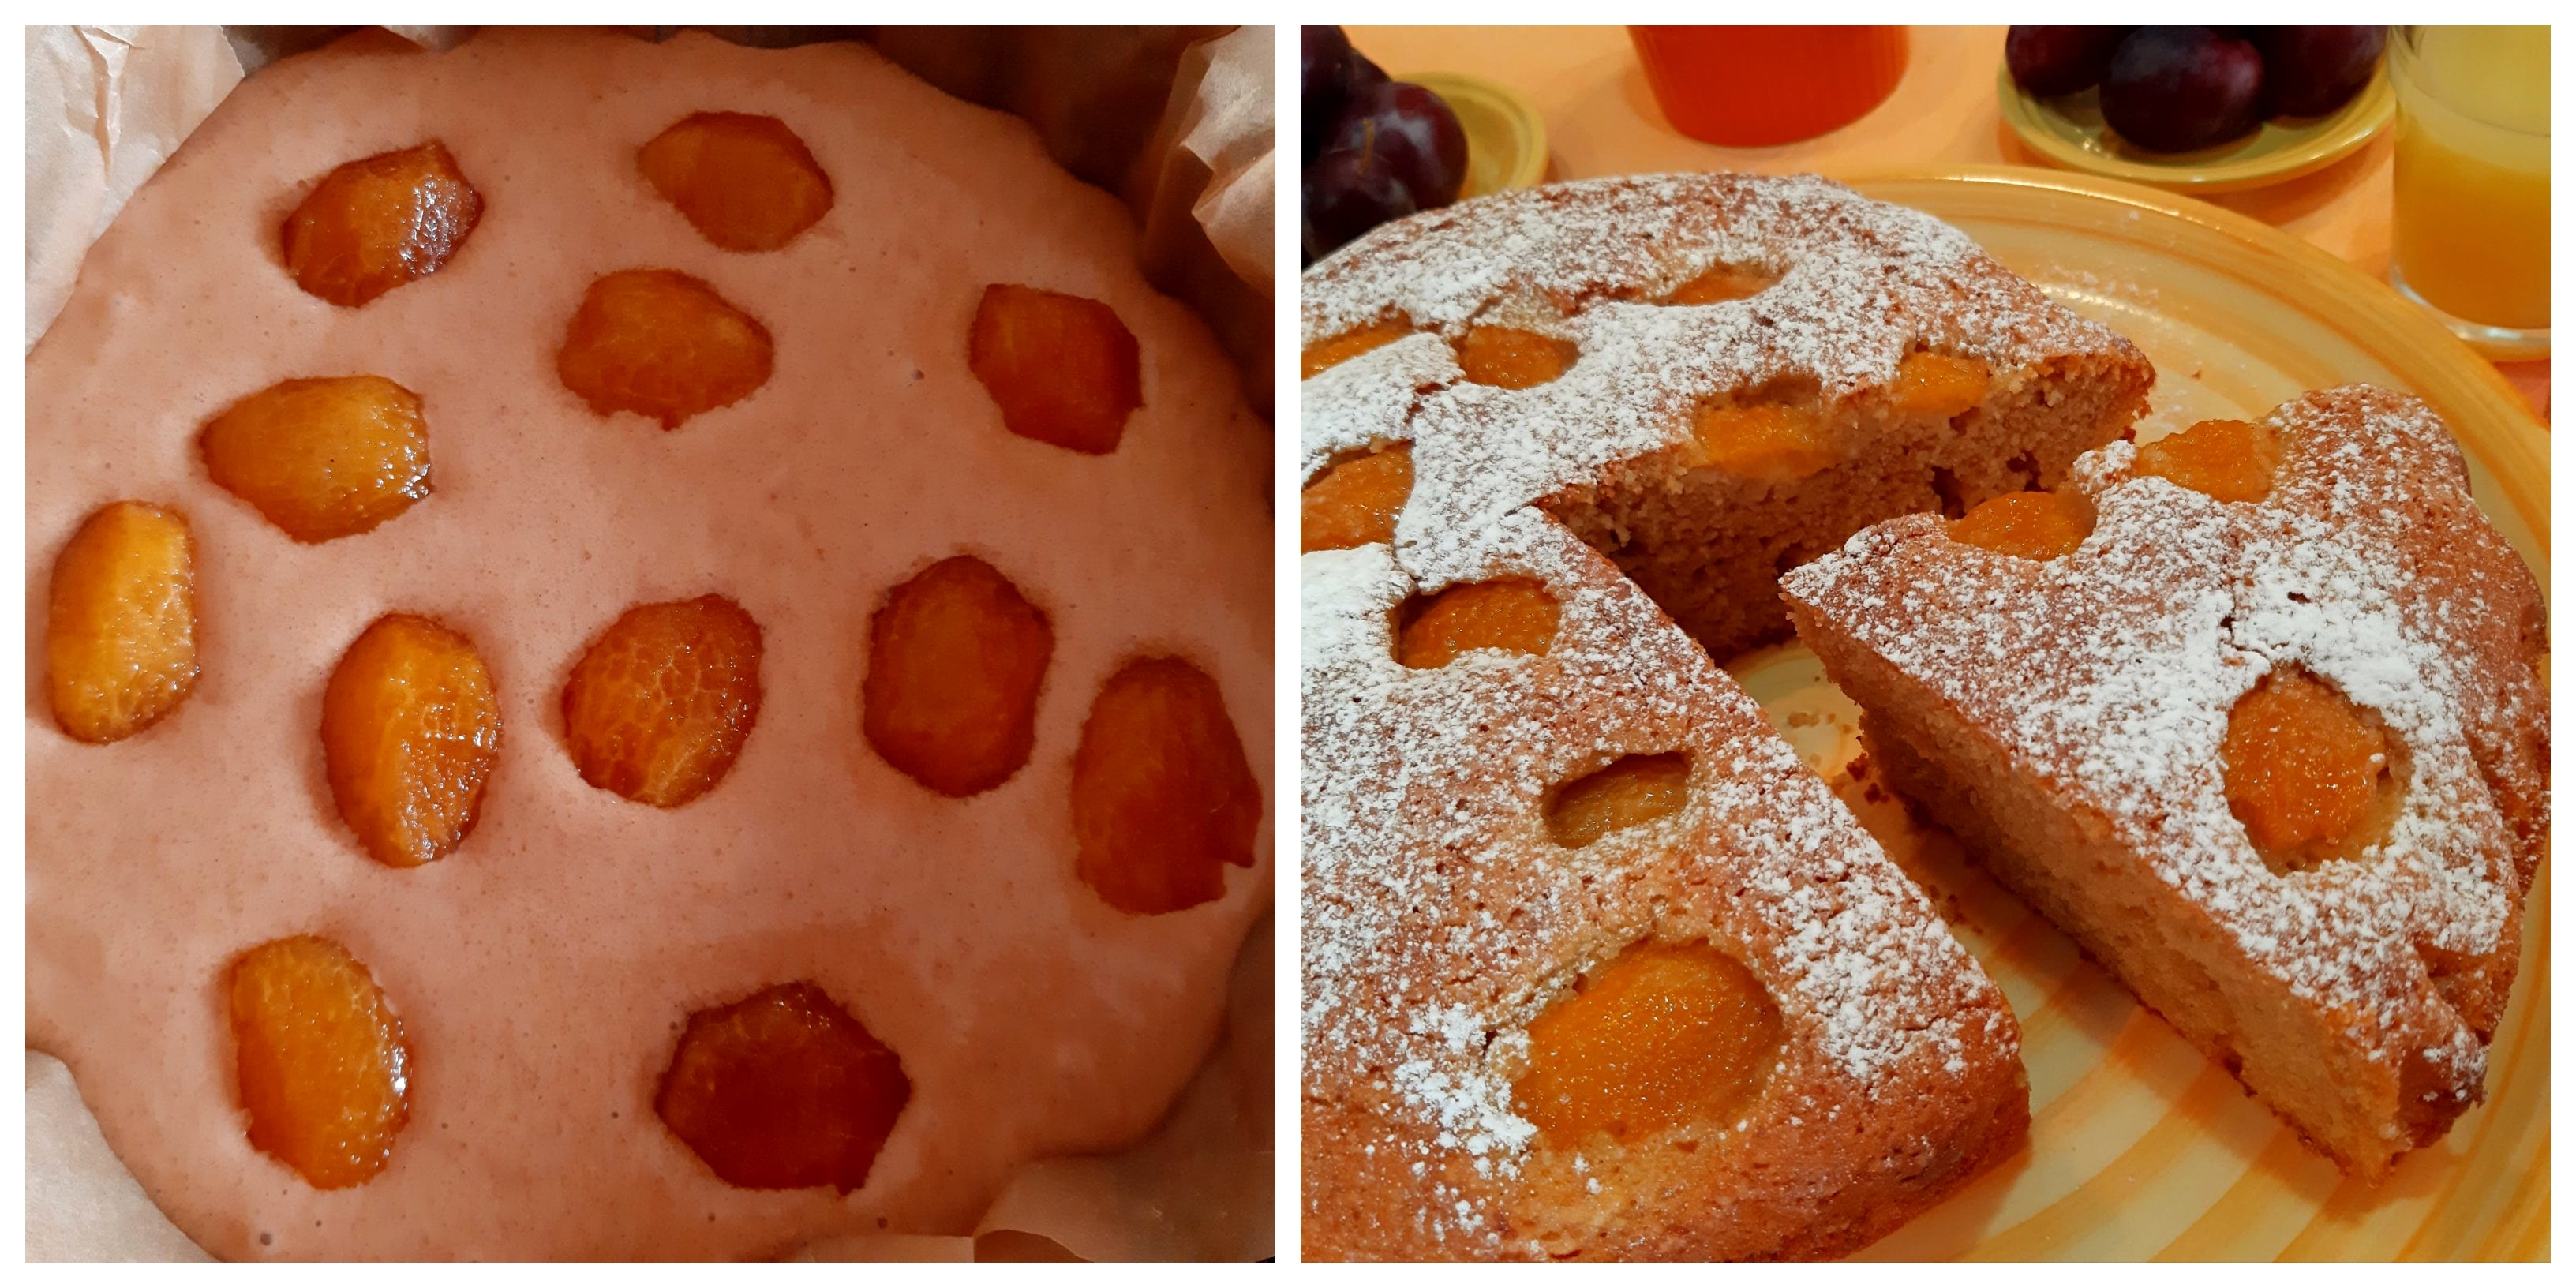 torta prugne box@VG-2